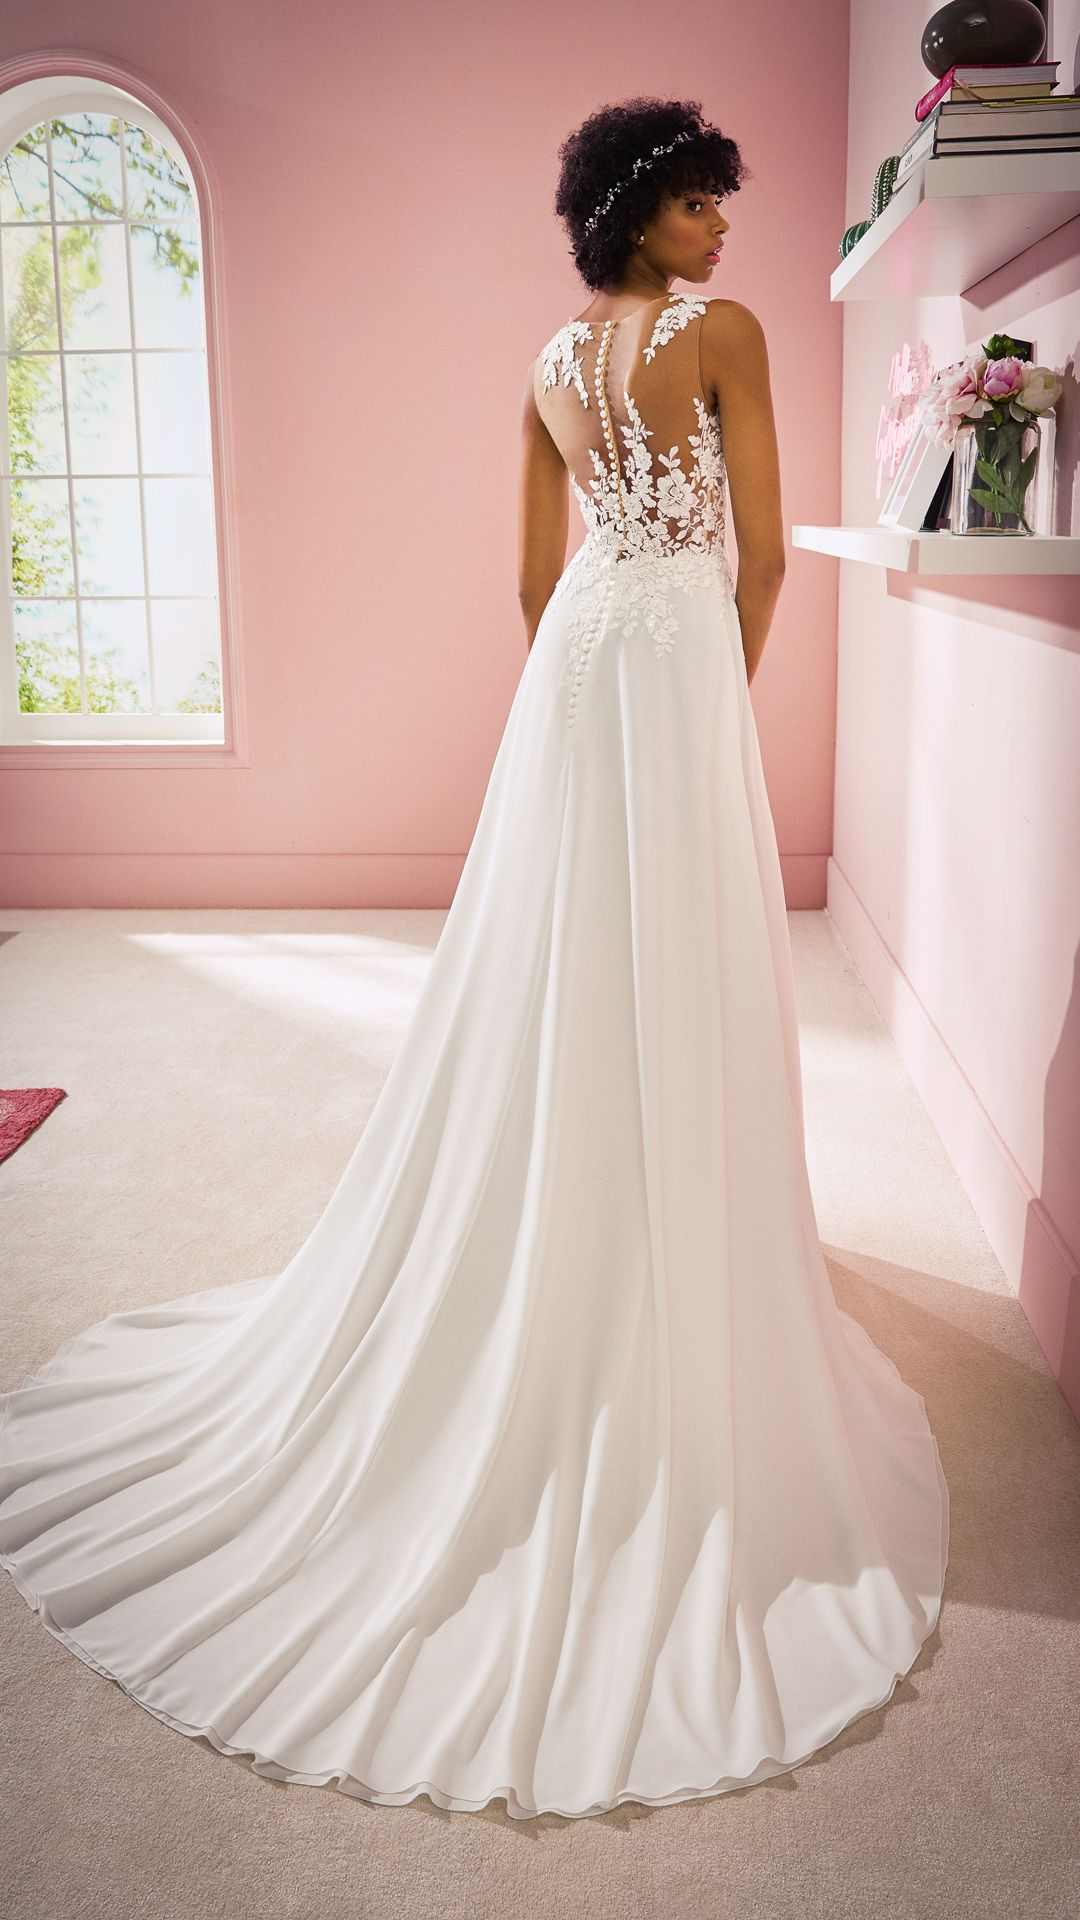 Hochzeitskleider 20 White One Kollektion Modell: AMA-C